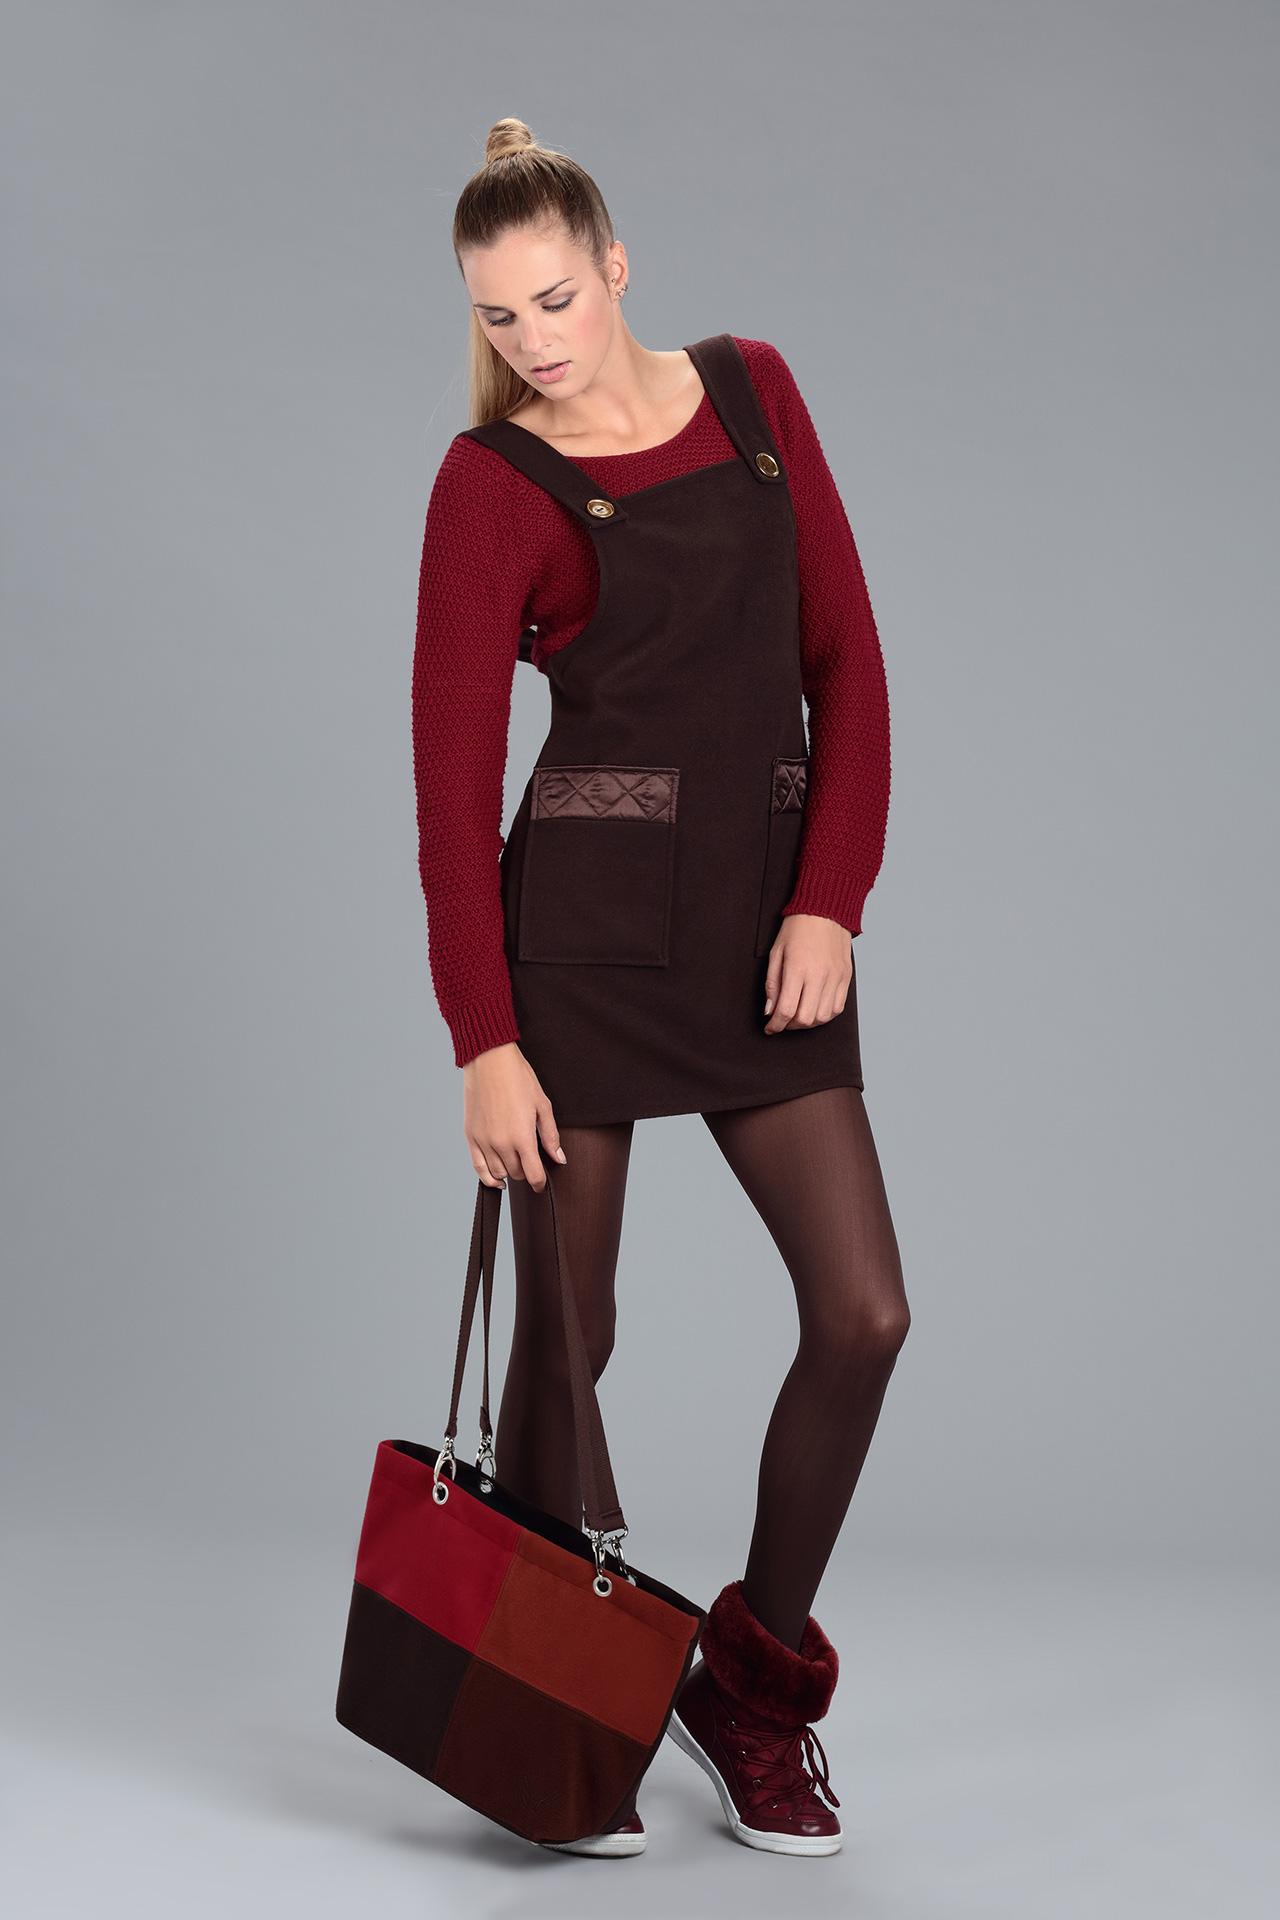 Robe Salopette en lainage marron (Look 2 avec sac)